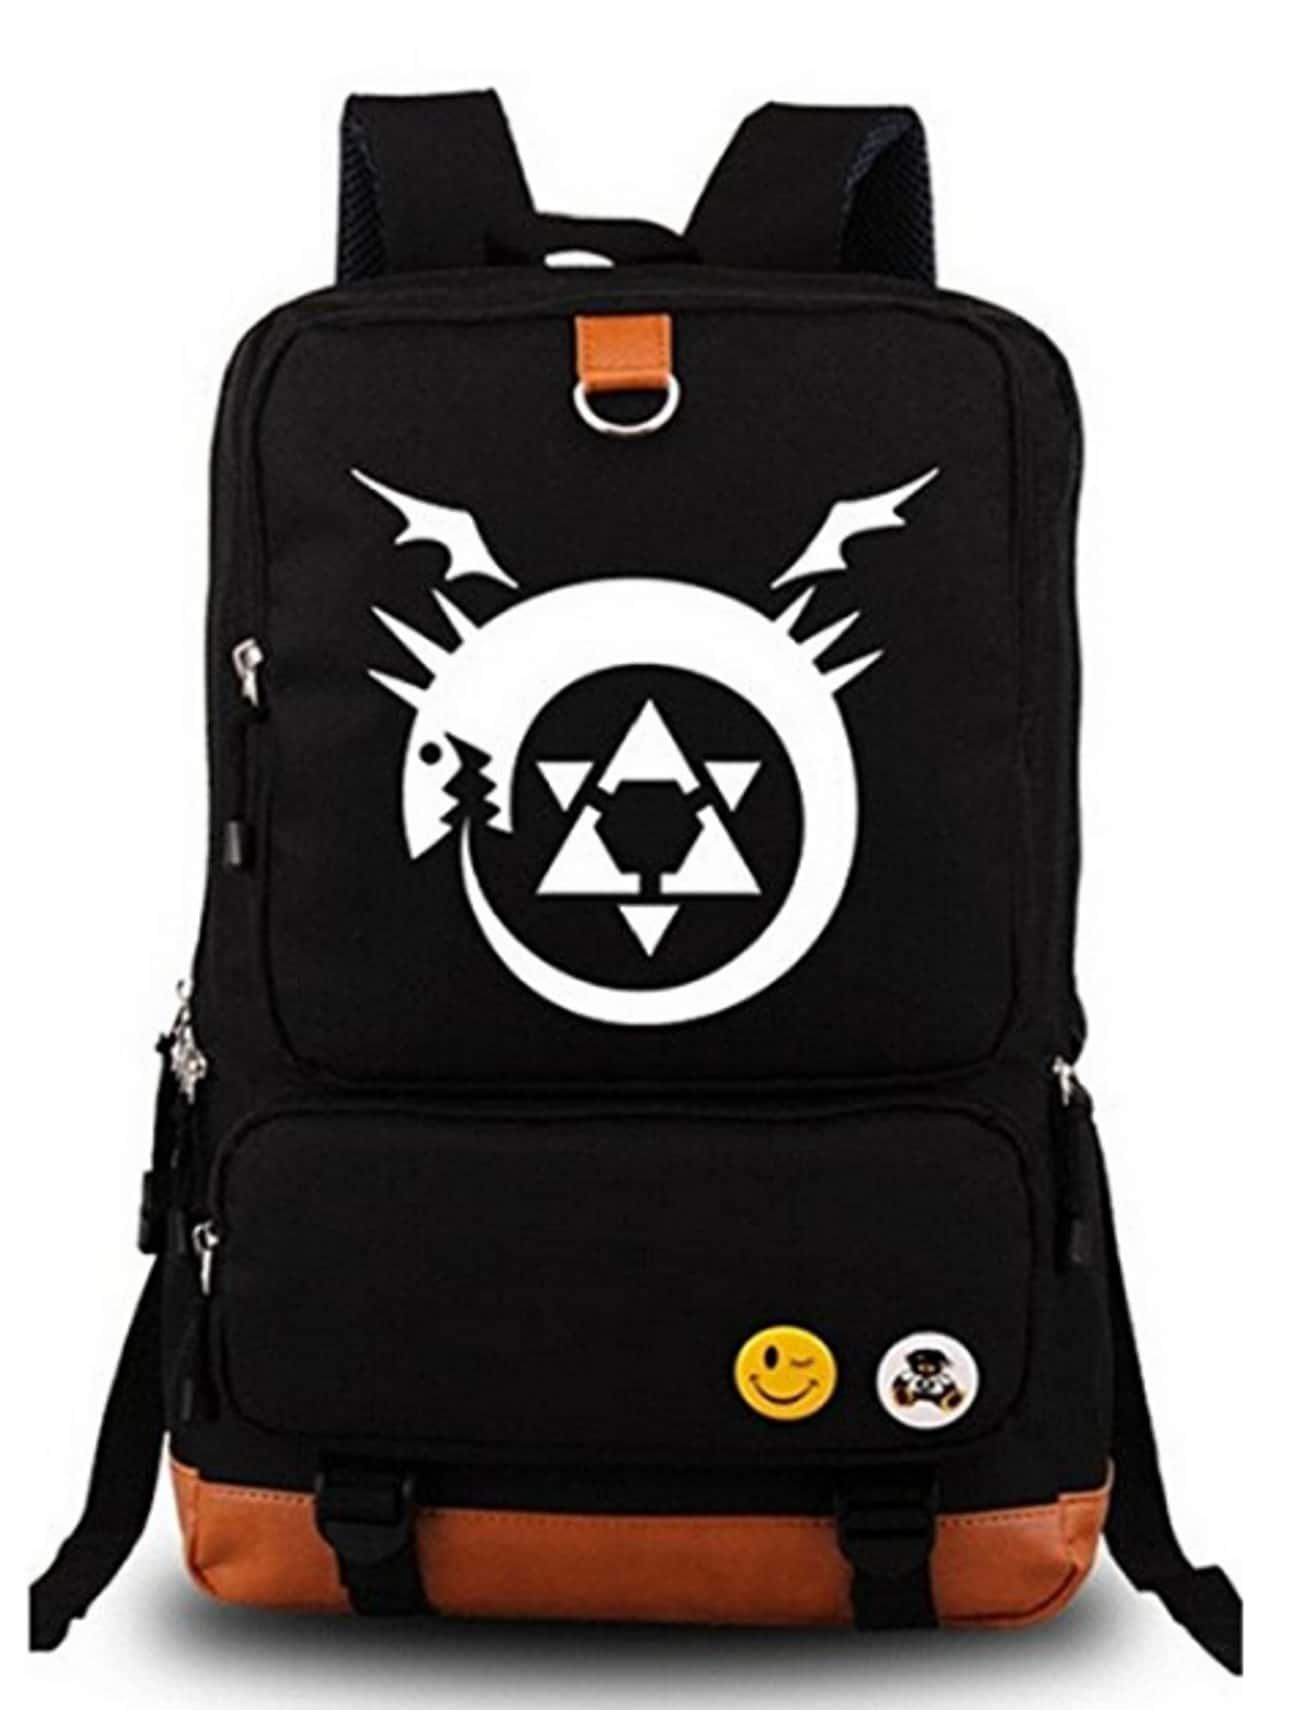 Siawasey® Fullmetal Alchemist Backpack